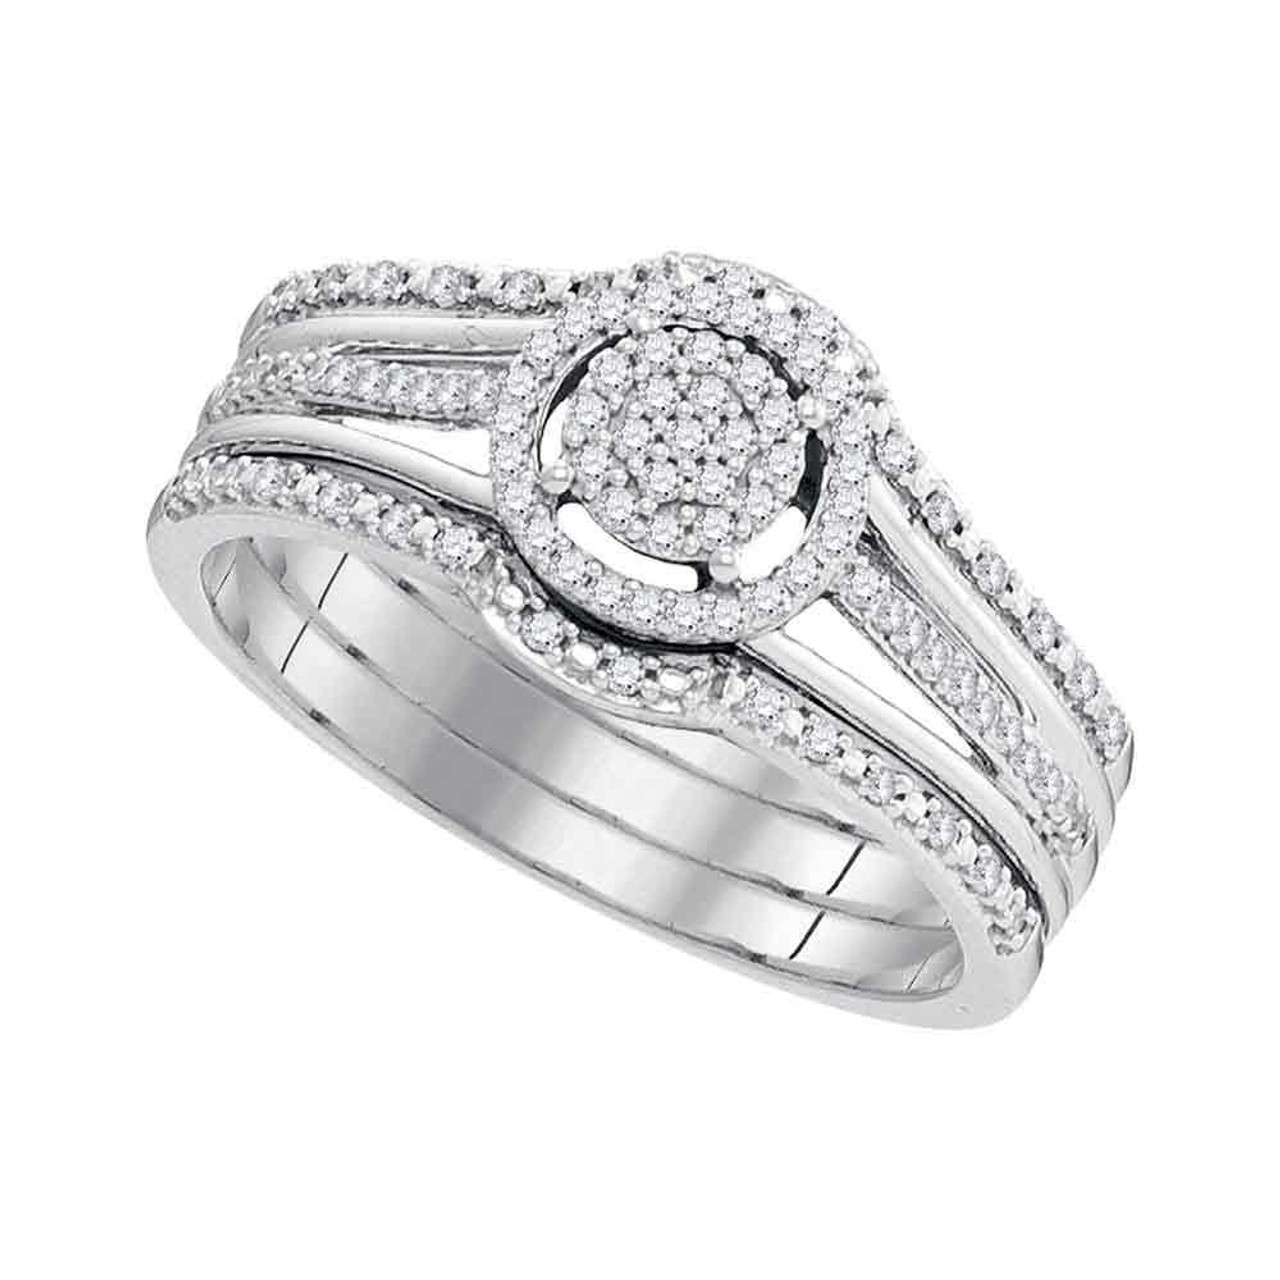 10kt White Gold Womens Round Diamond Cluster 3 Piece Bridal Wedding Engagement Ring Band Set 1 4 Cttw